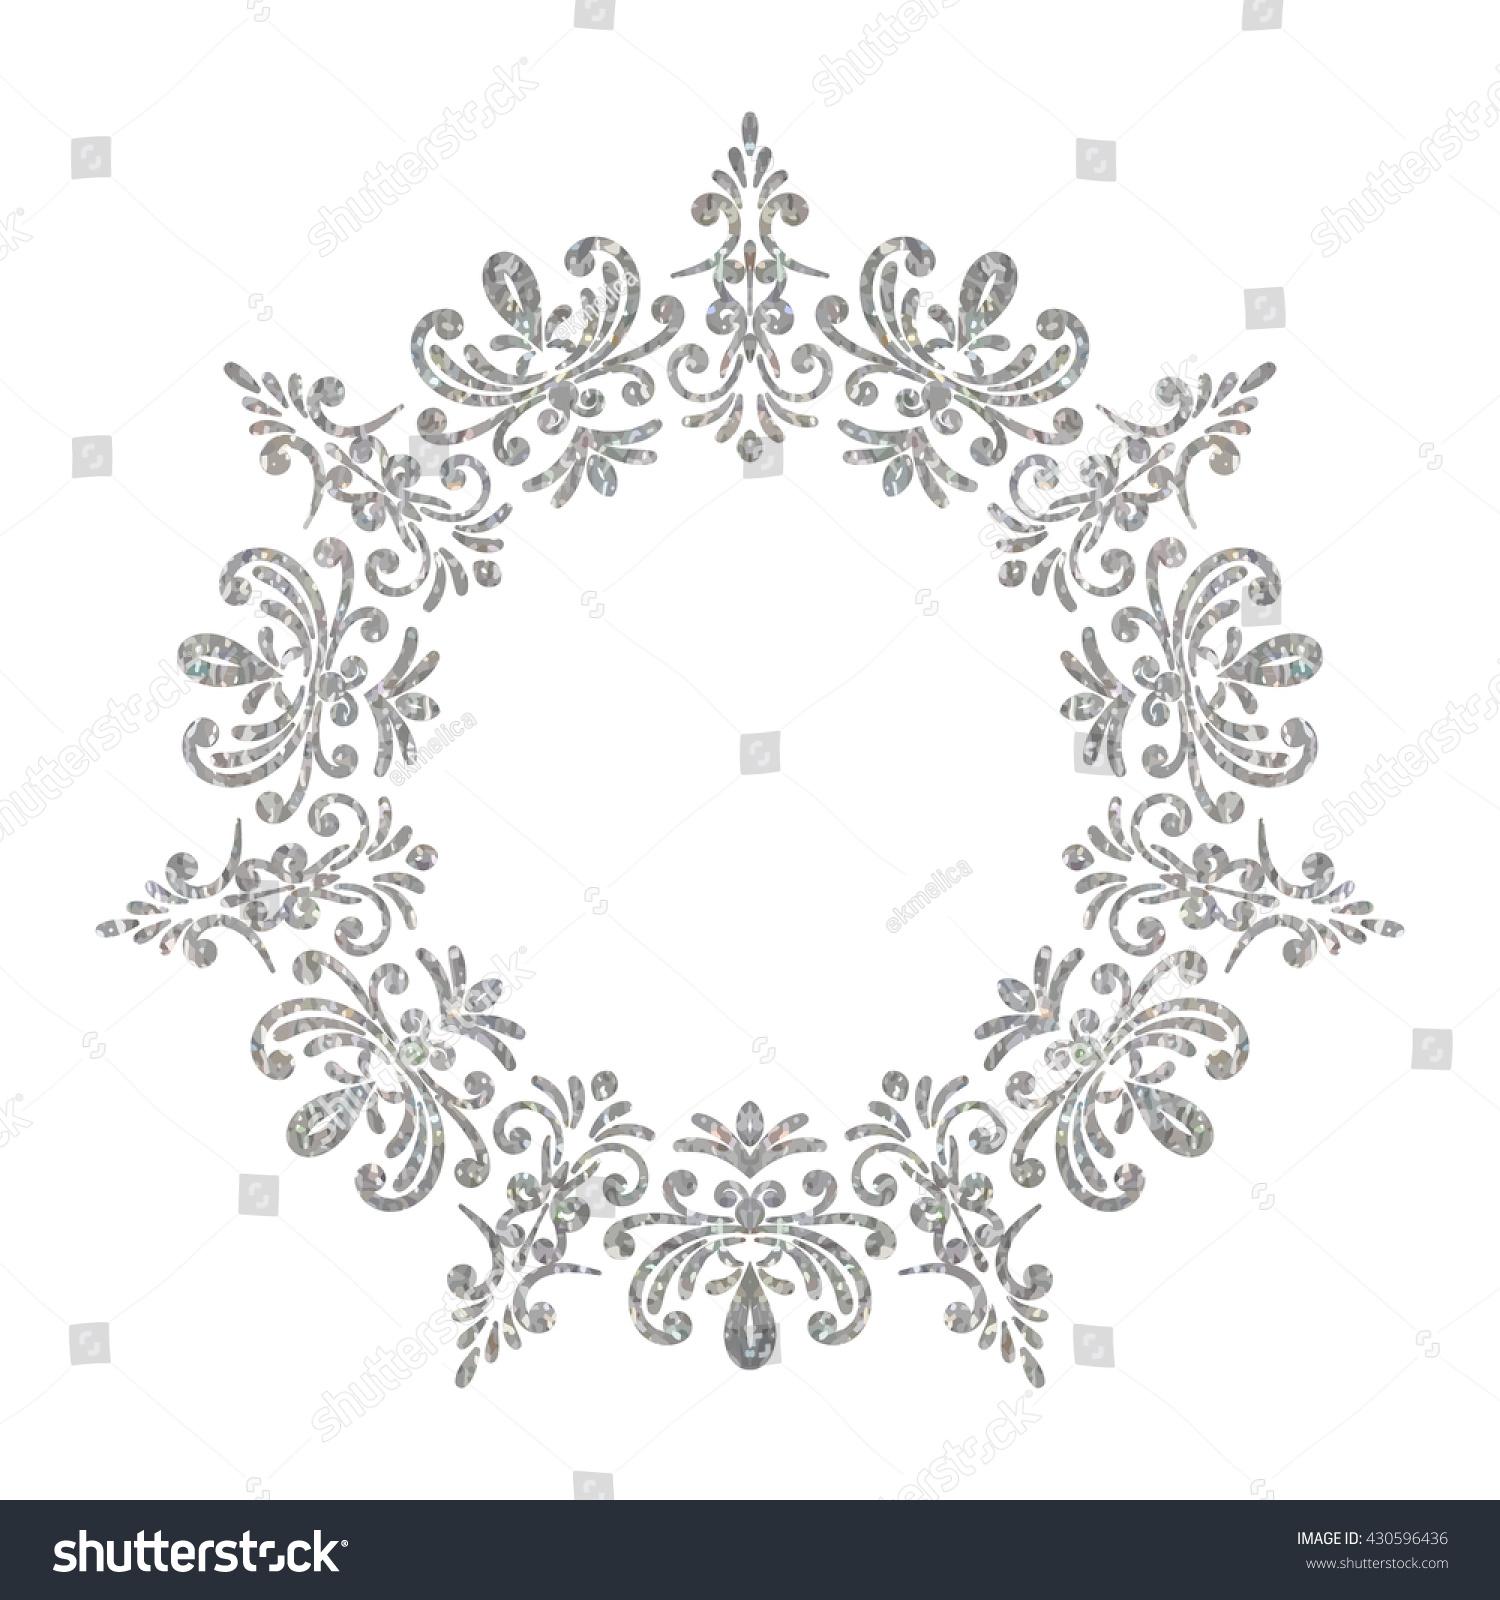 elegant luxury vintage circle silver floral stock